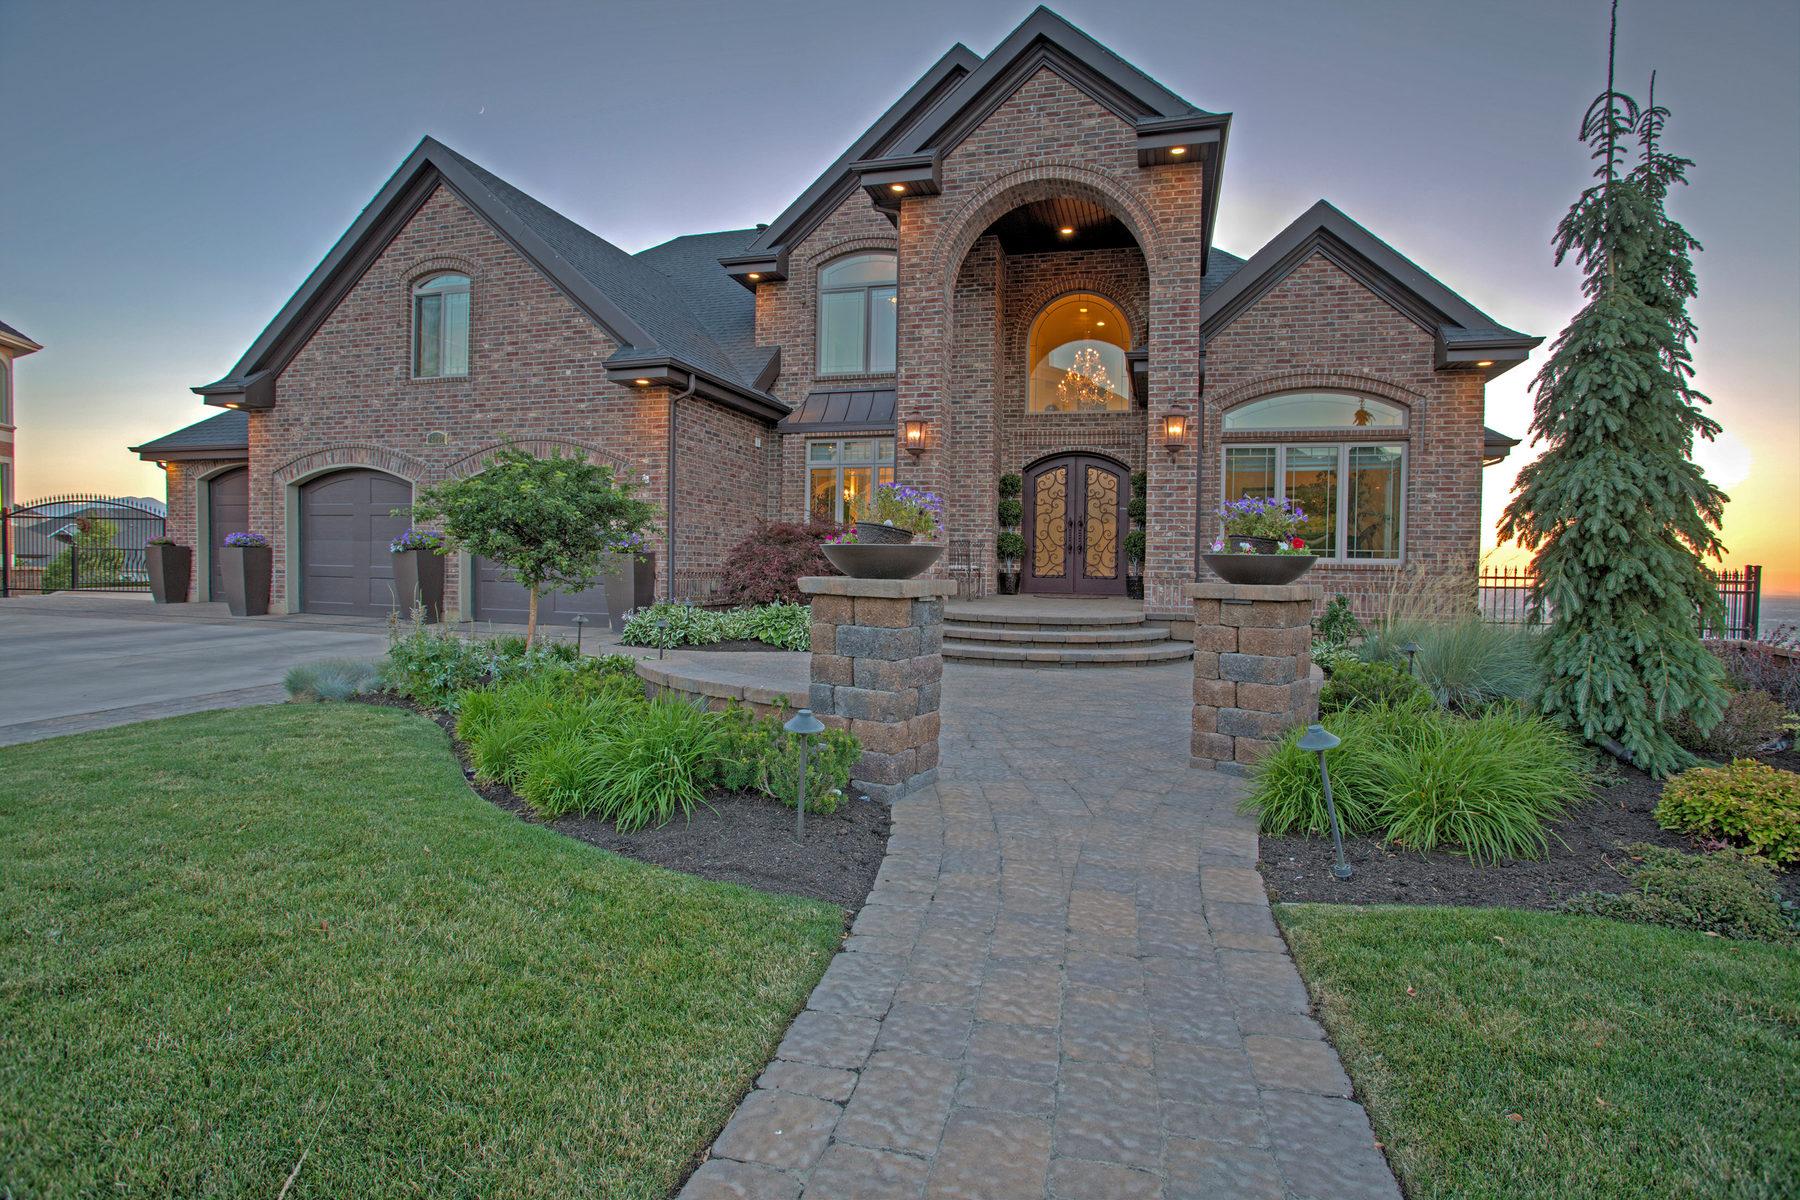 Villa per Vendita alle ore Corner Canyon Grandeur 14032 S Canyon Vista Ln Draper, Utah, 84020 Stati Uniti